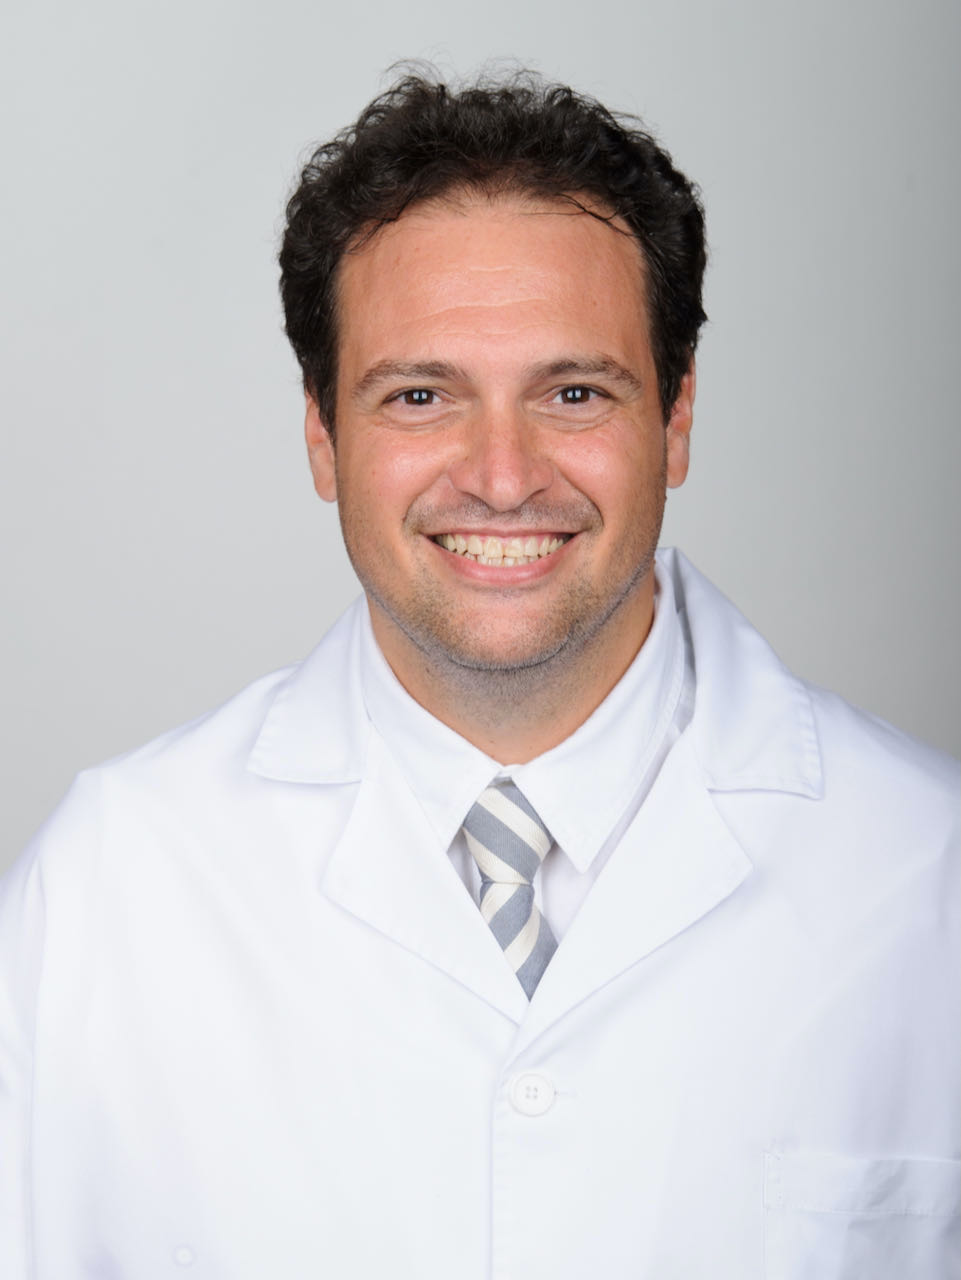 dr-david-garcia-belmonte